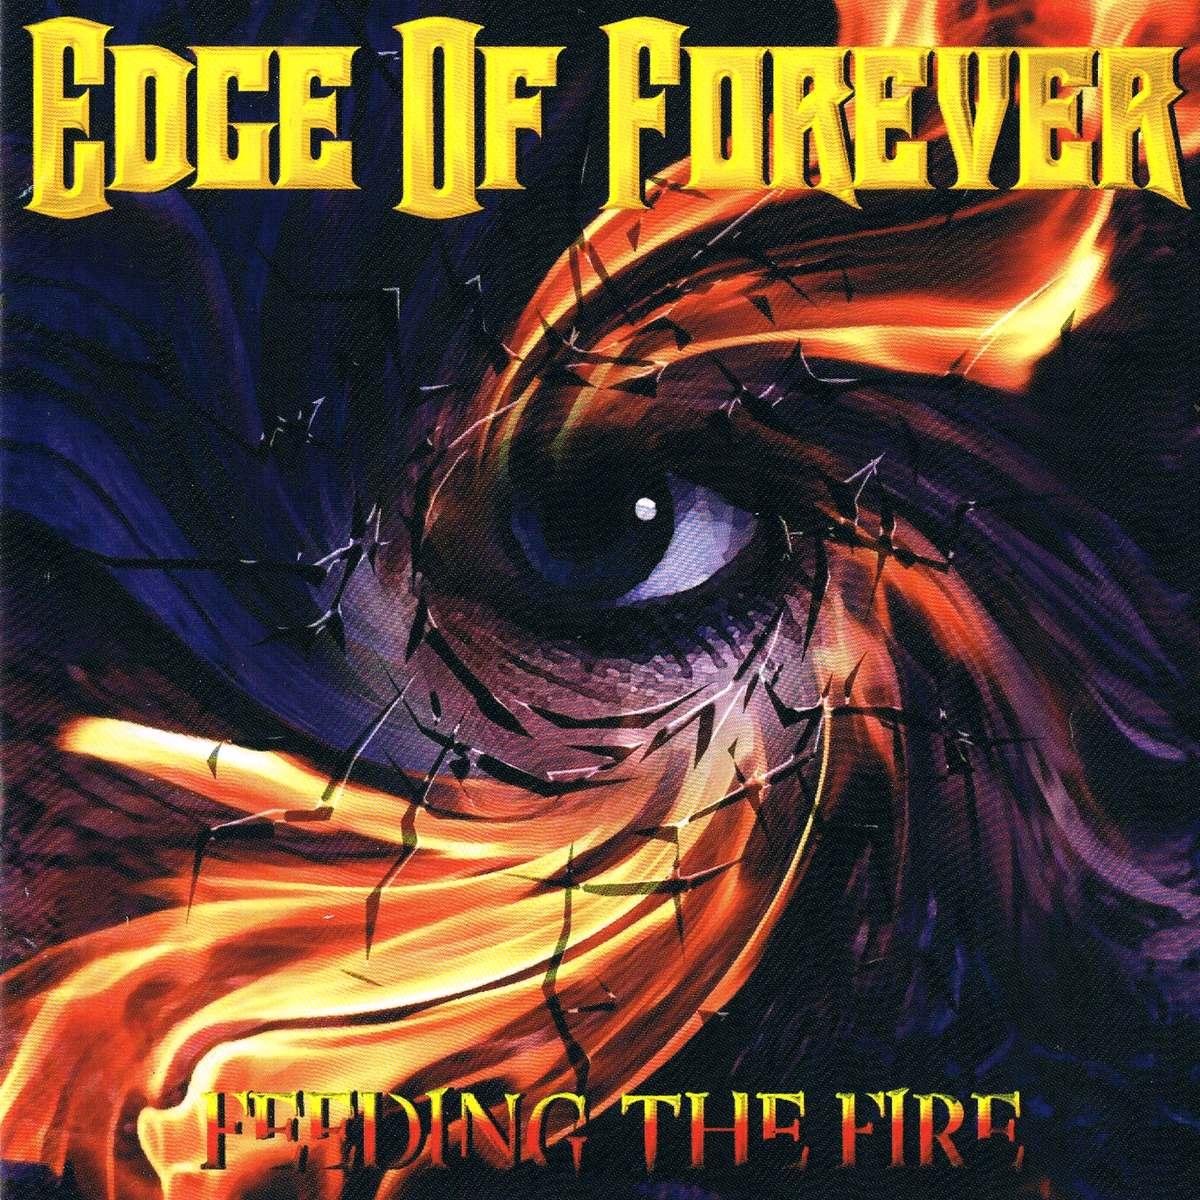 Edge of Forever - Feeding the Fire